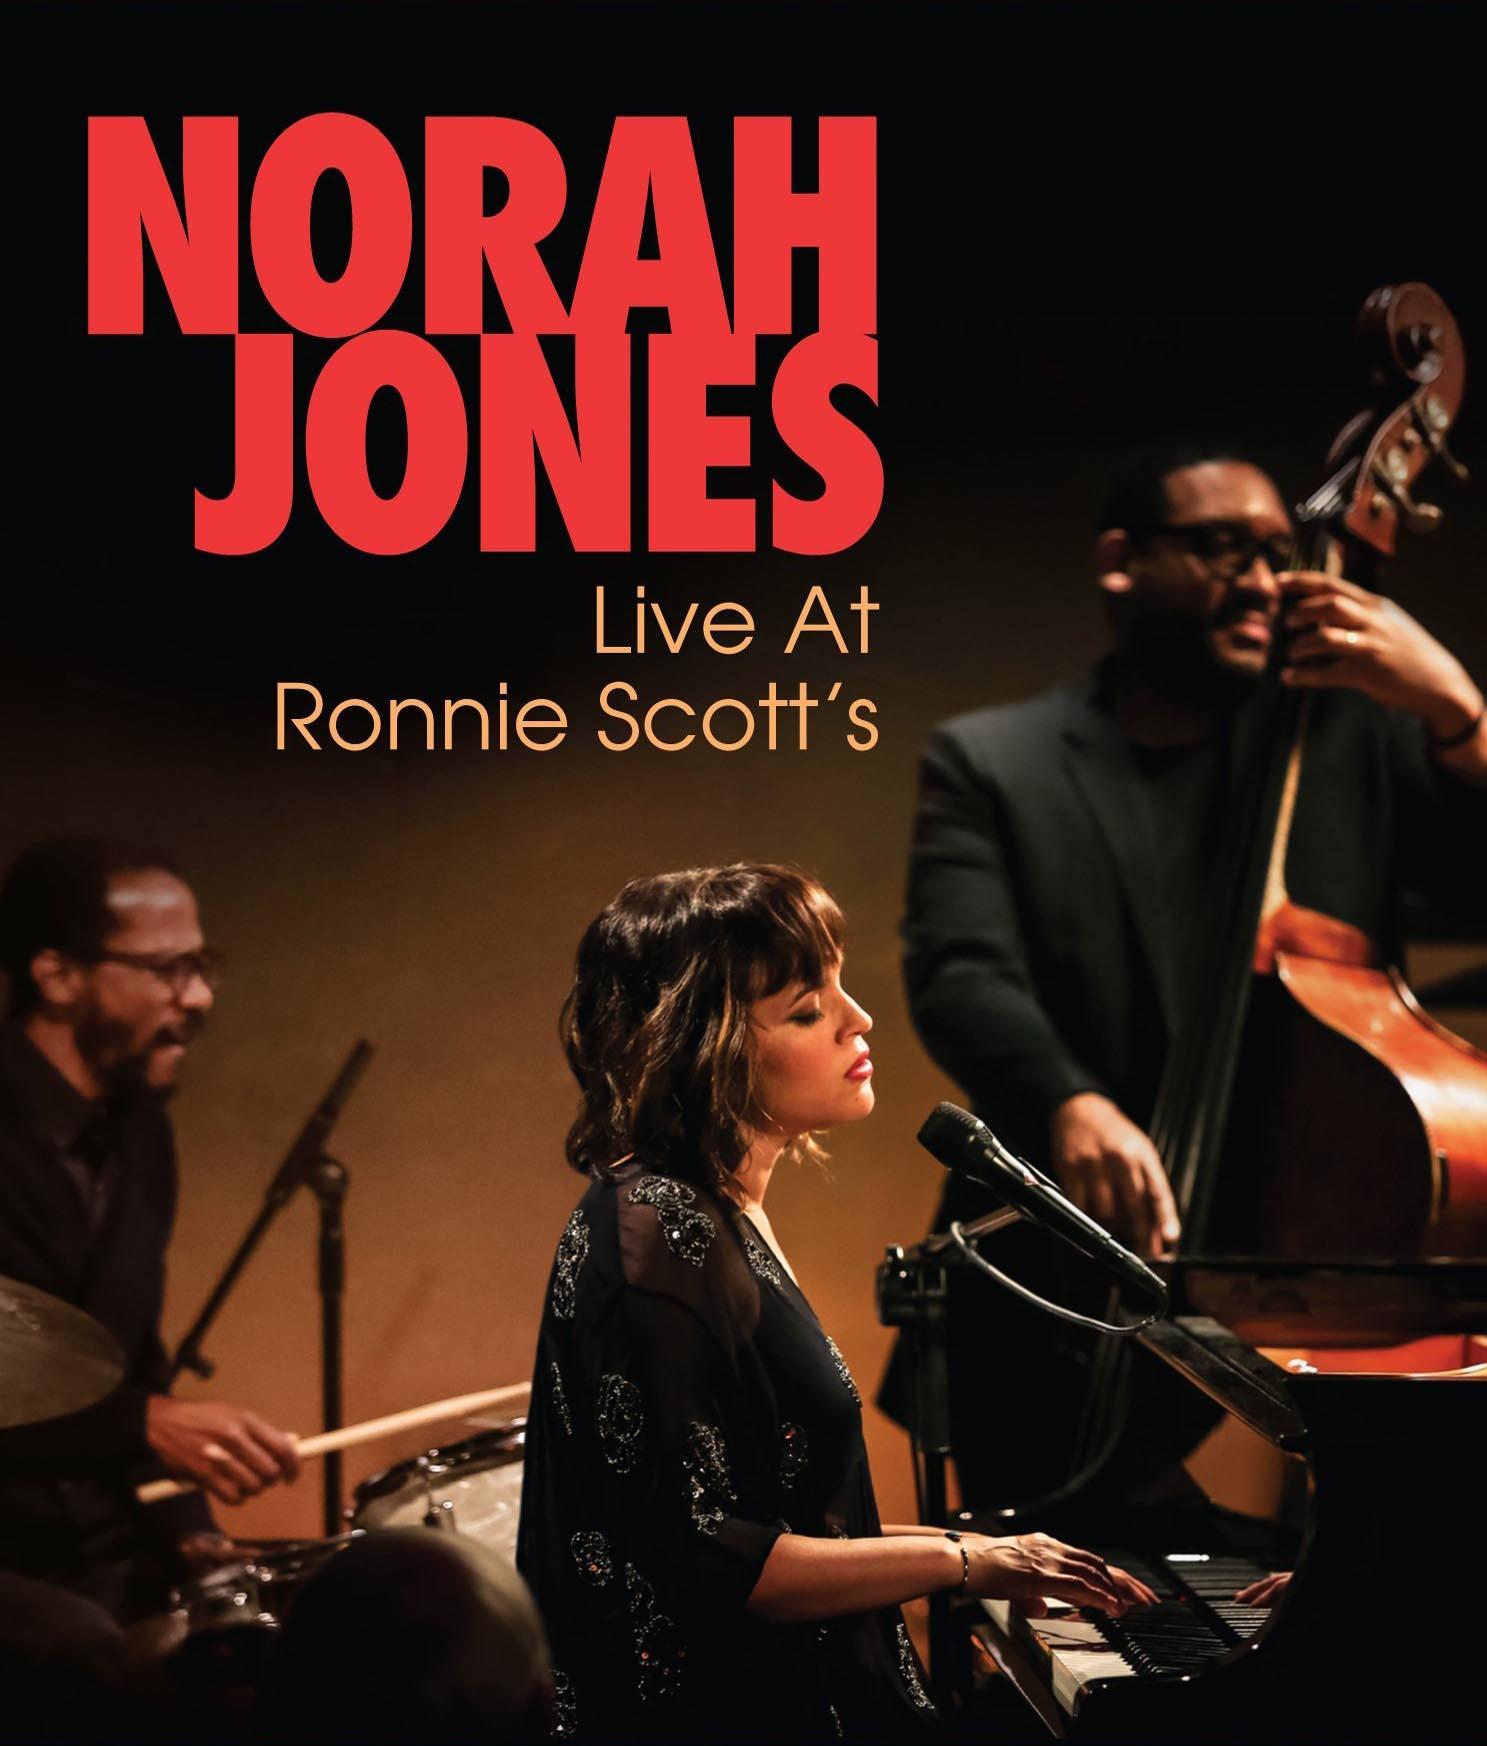 Norah Jones Live at Ronnie Scotts